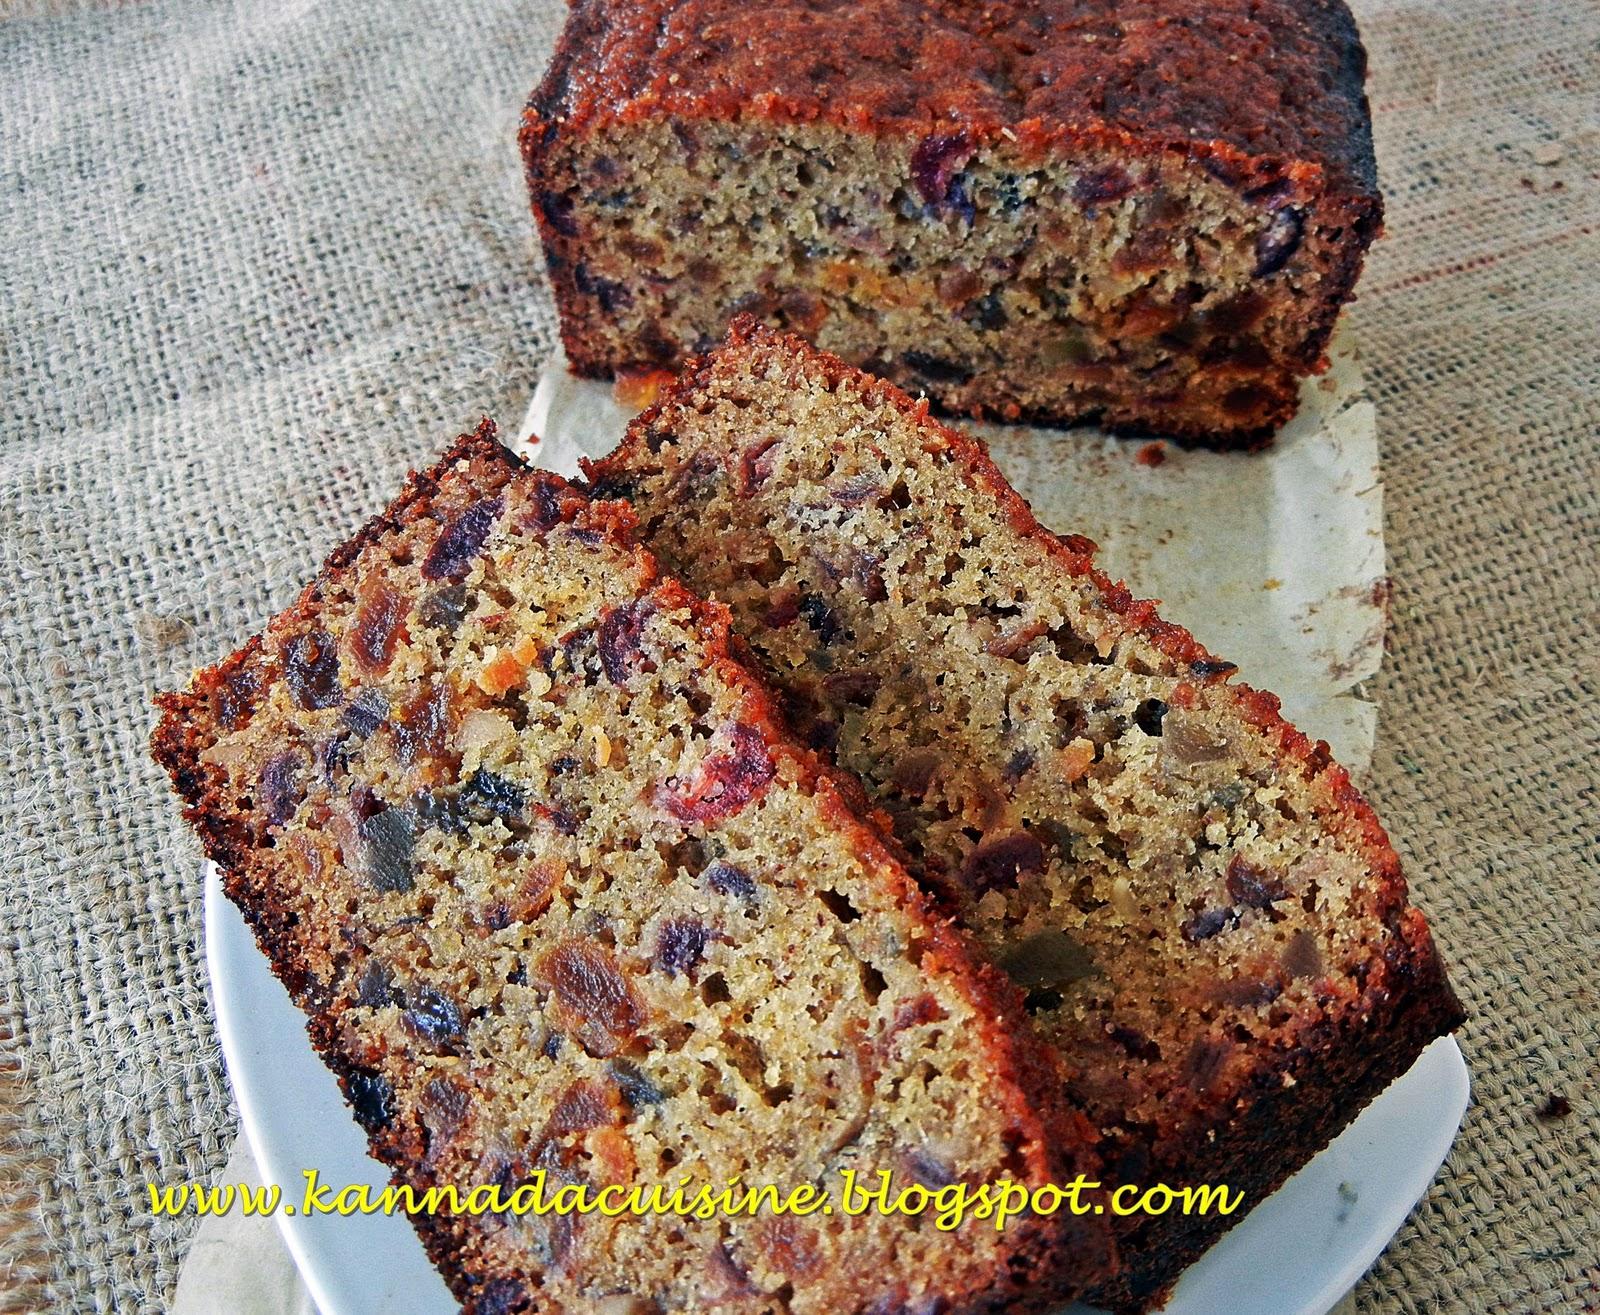 Cake Recipe In Kannada Video: KANNADA CUISINE: Fruit Cake